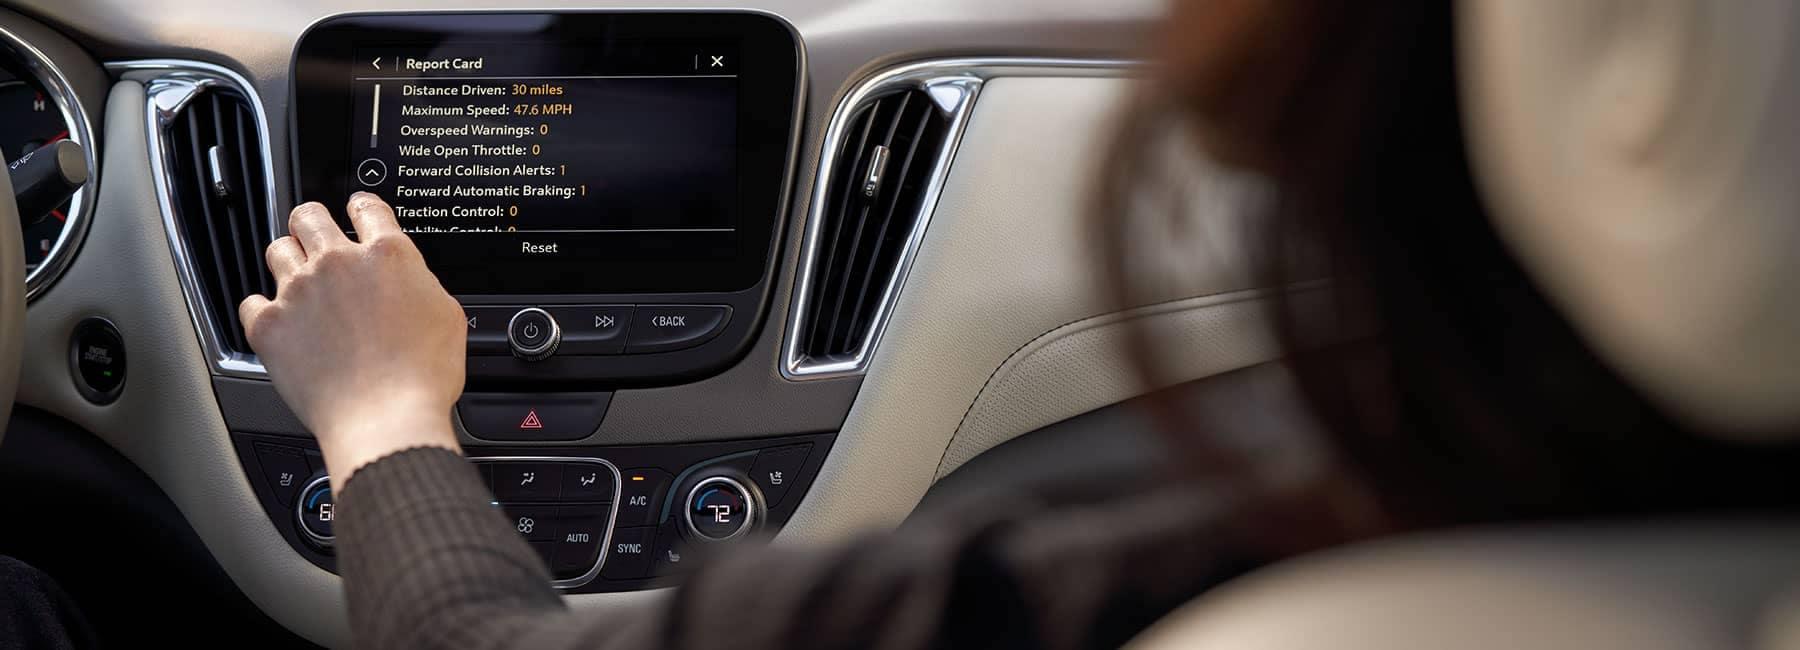 2019 Chevrolet  interior dash